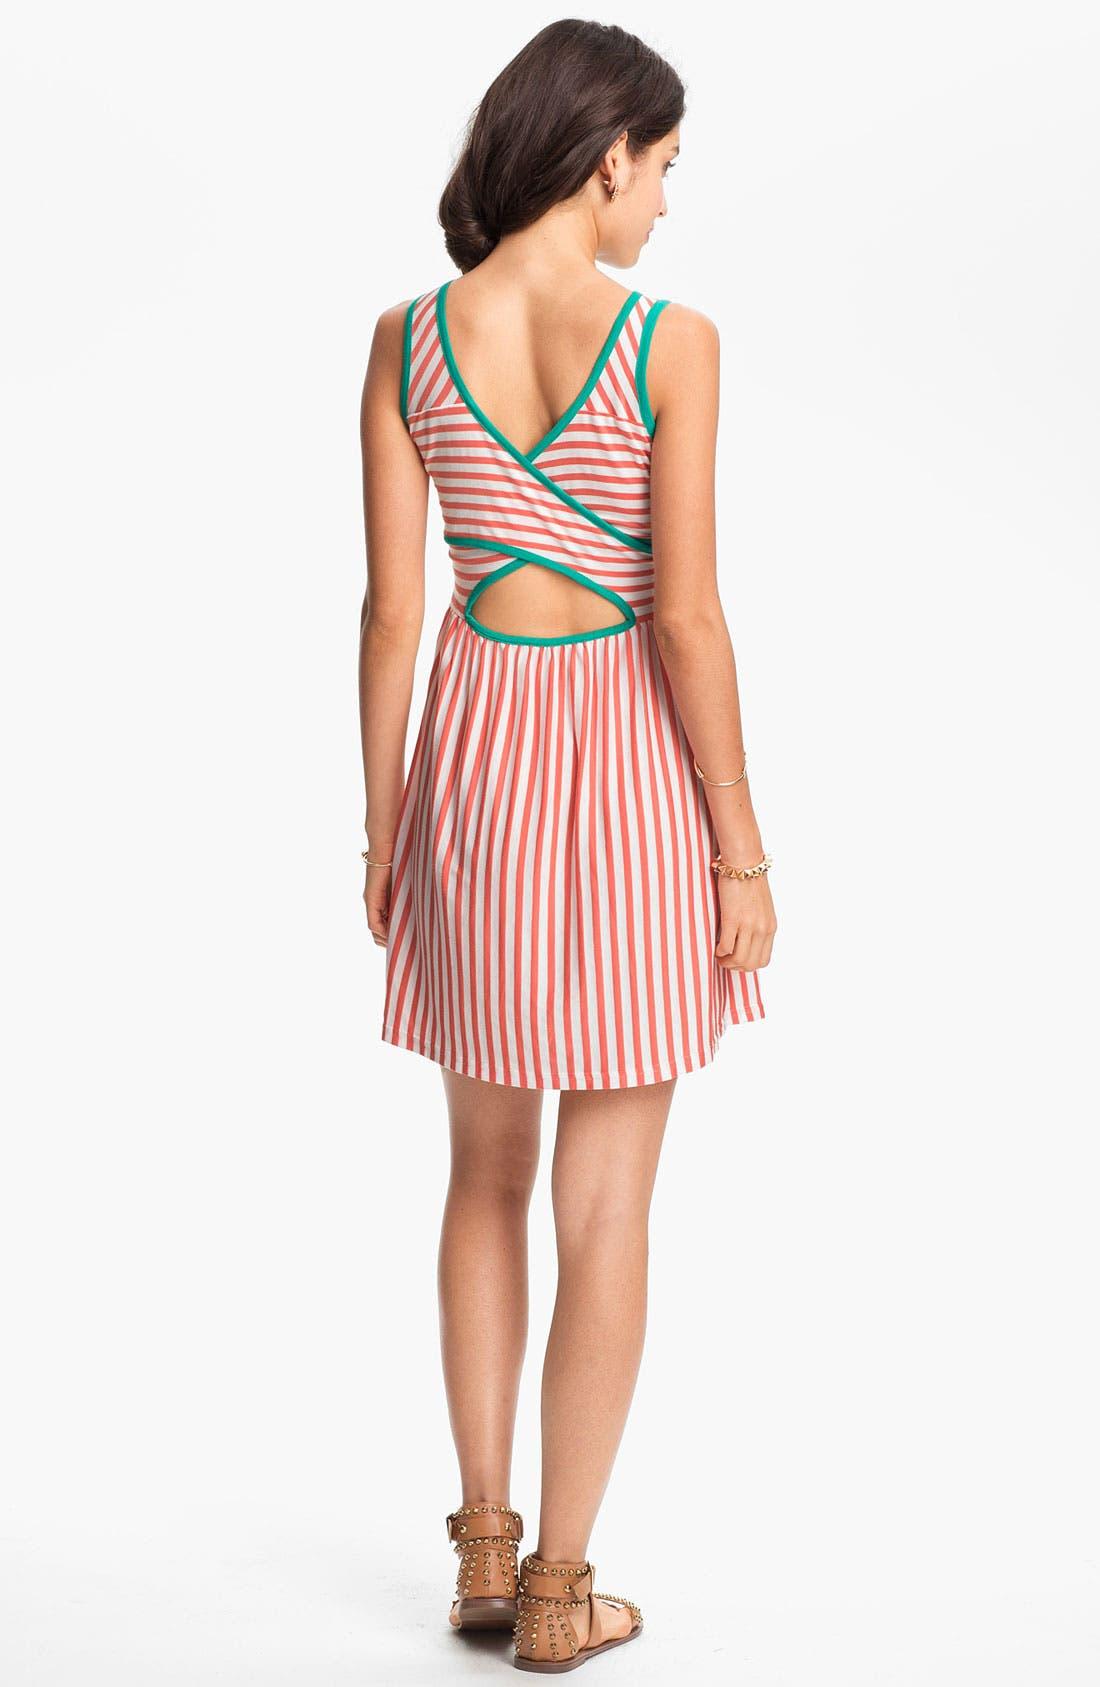 Main Image - JJ Basics Striped Crisscross Back Dress (Juniors)